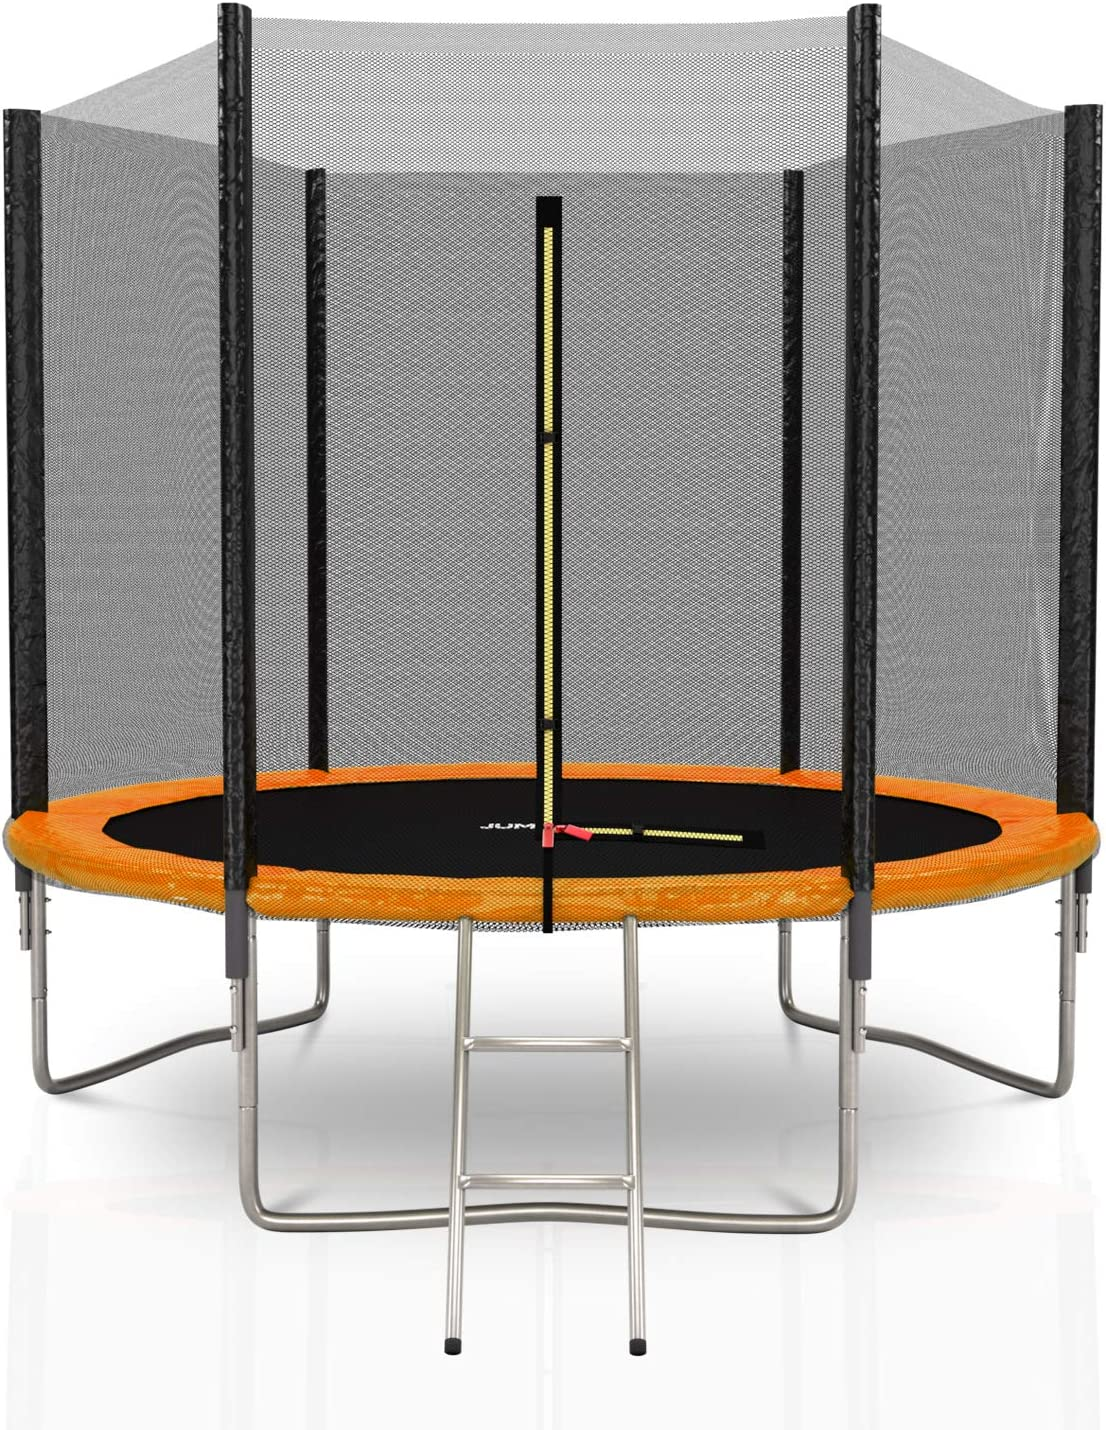 JUMP4FUN - Cama elástica Exterior de 244 cm, 4 Colores a Elegir: Azul, Negro, Verde Manzana, Naranja, Niño, Naranja, 8FT - ø 244CM: Amazon.es: Deportes y aire libre